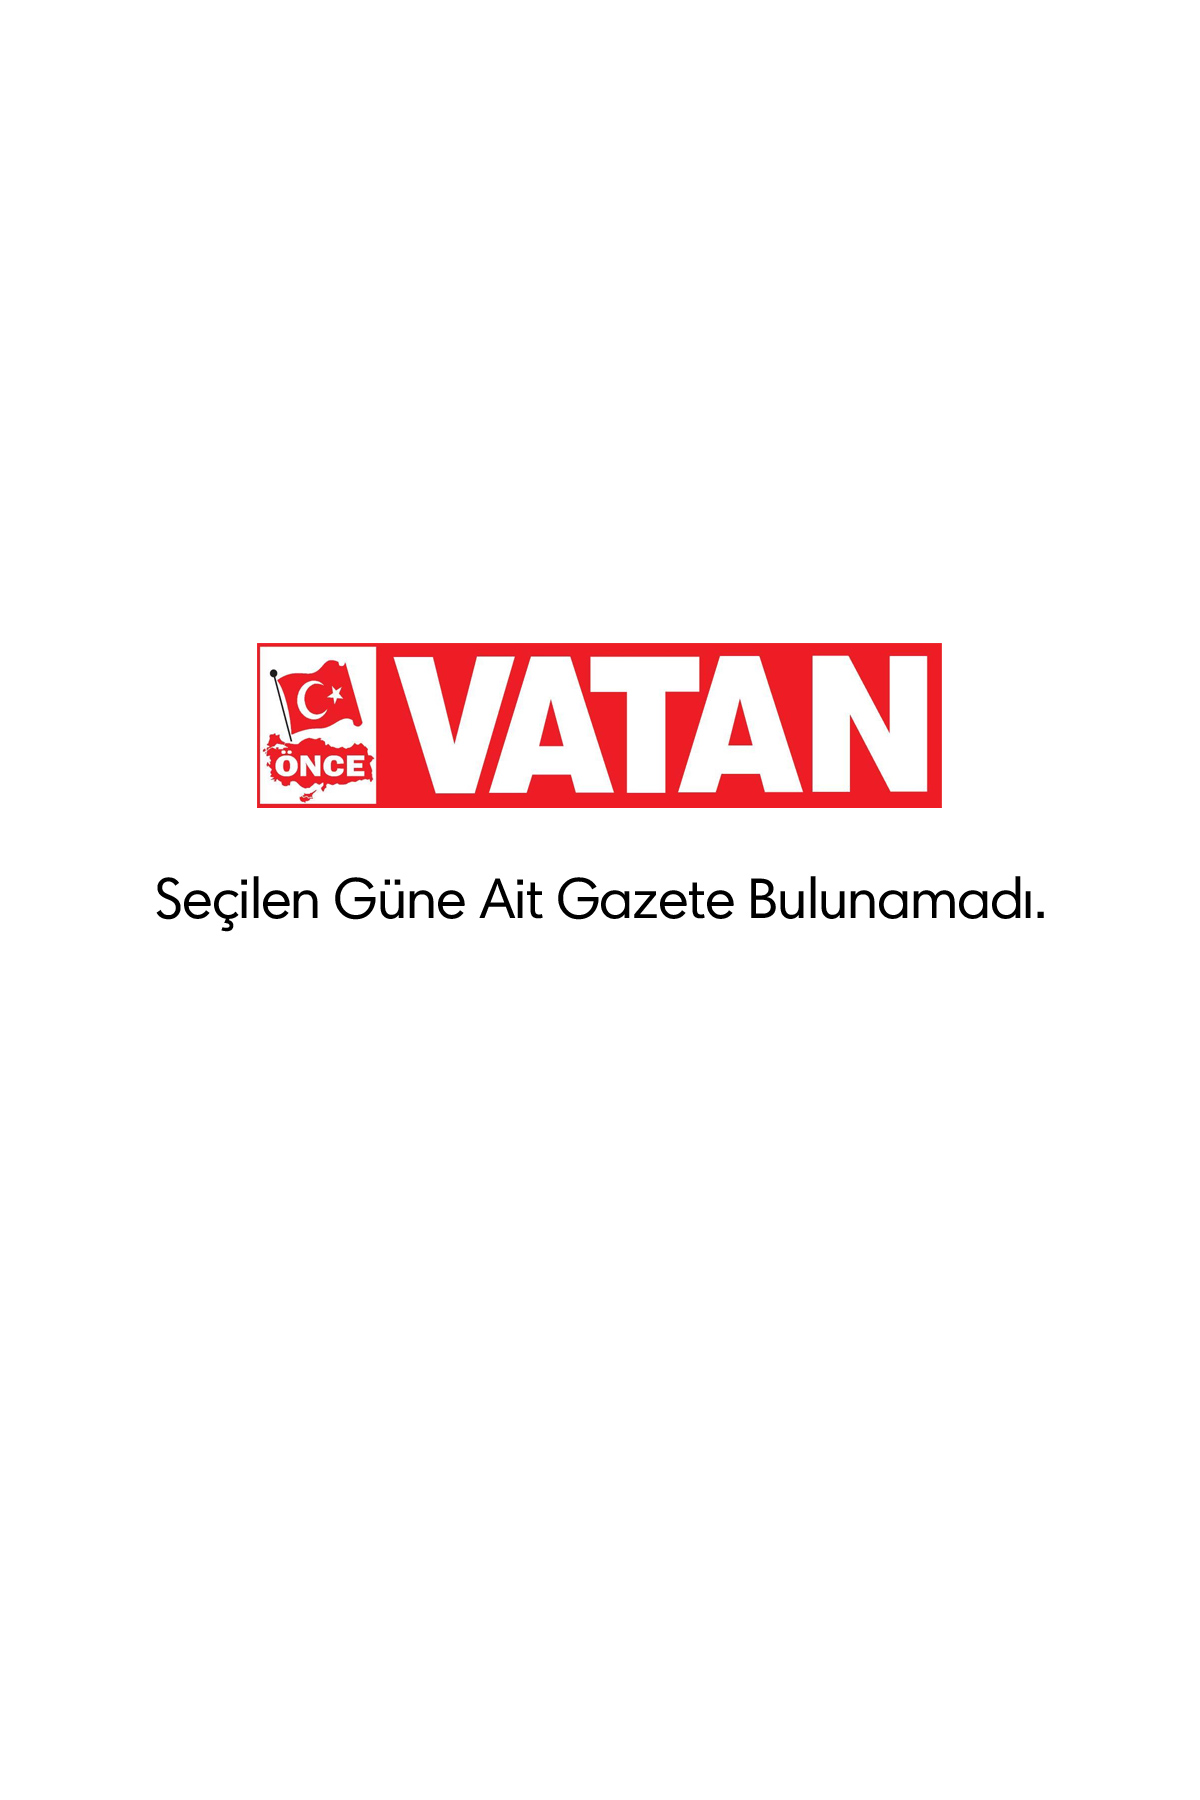 Önce Vatan